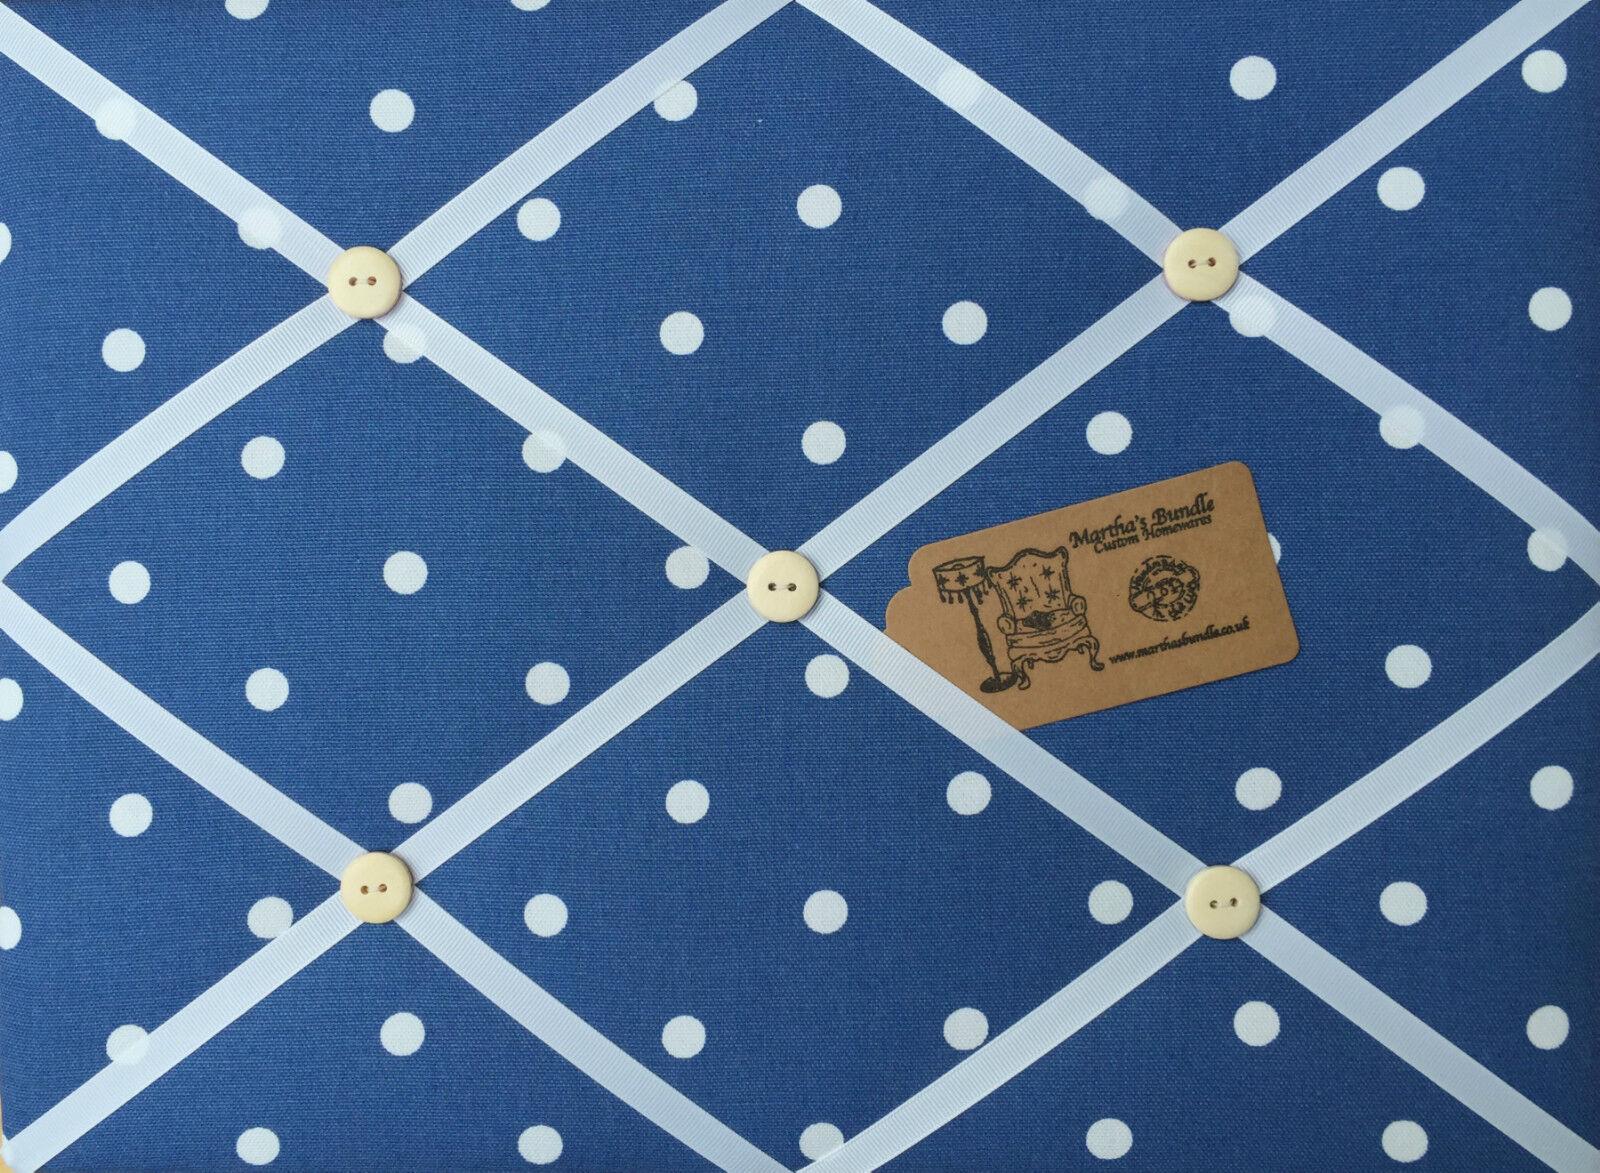 Clarke & Clark Dotty Spot Tela Denim Denim Denim Pin Memo Tablón de anuncios de corcho SML XL LG b8fe77